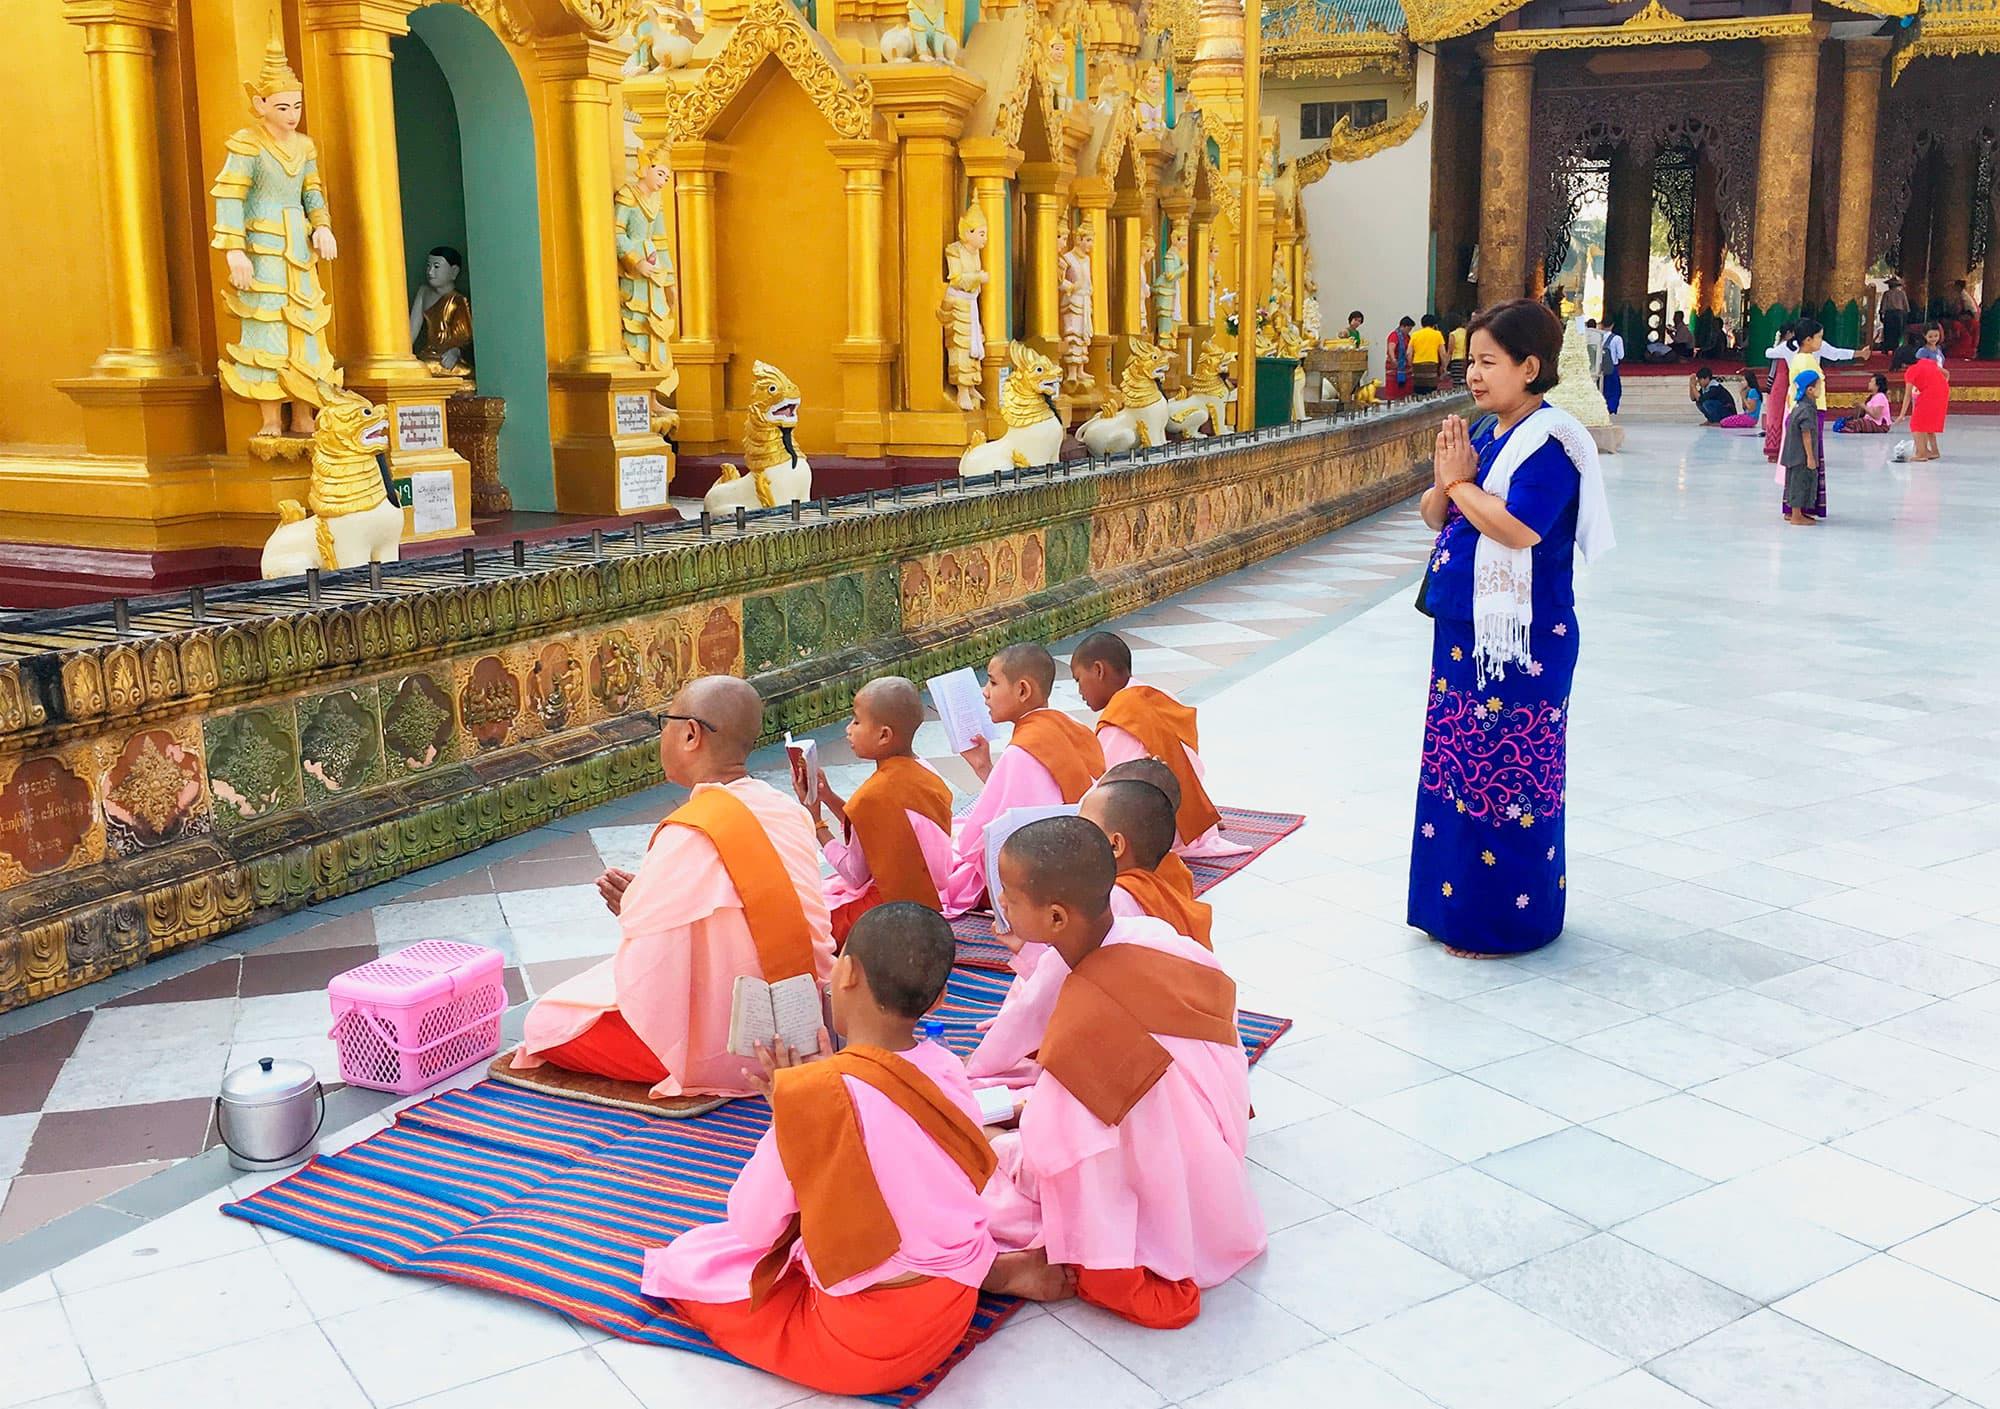 Myanmar espléndido, viaje de lujo - Myanmar- imagen #3